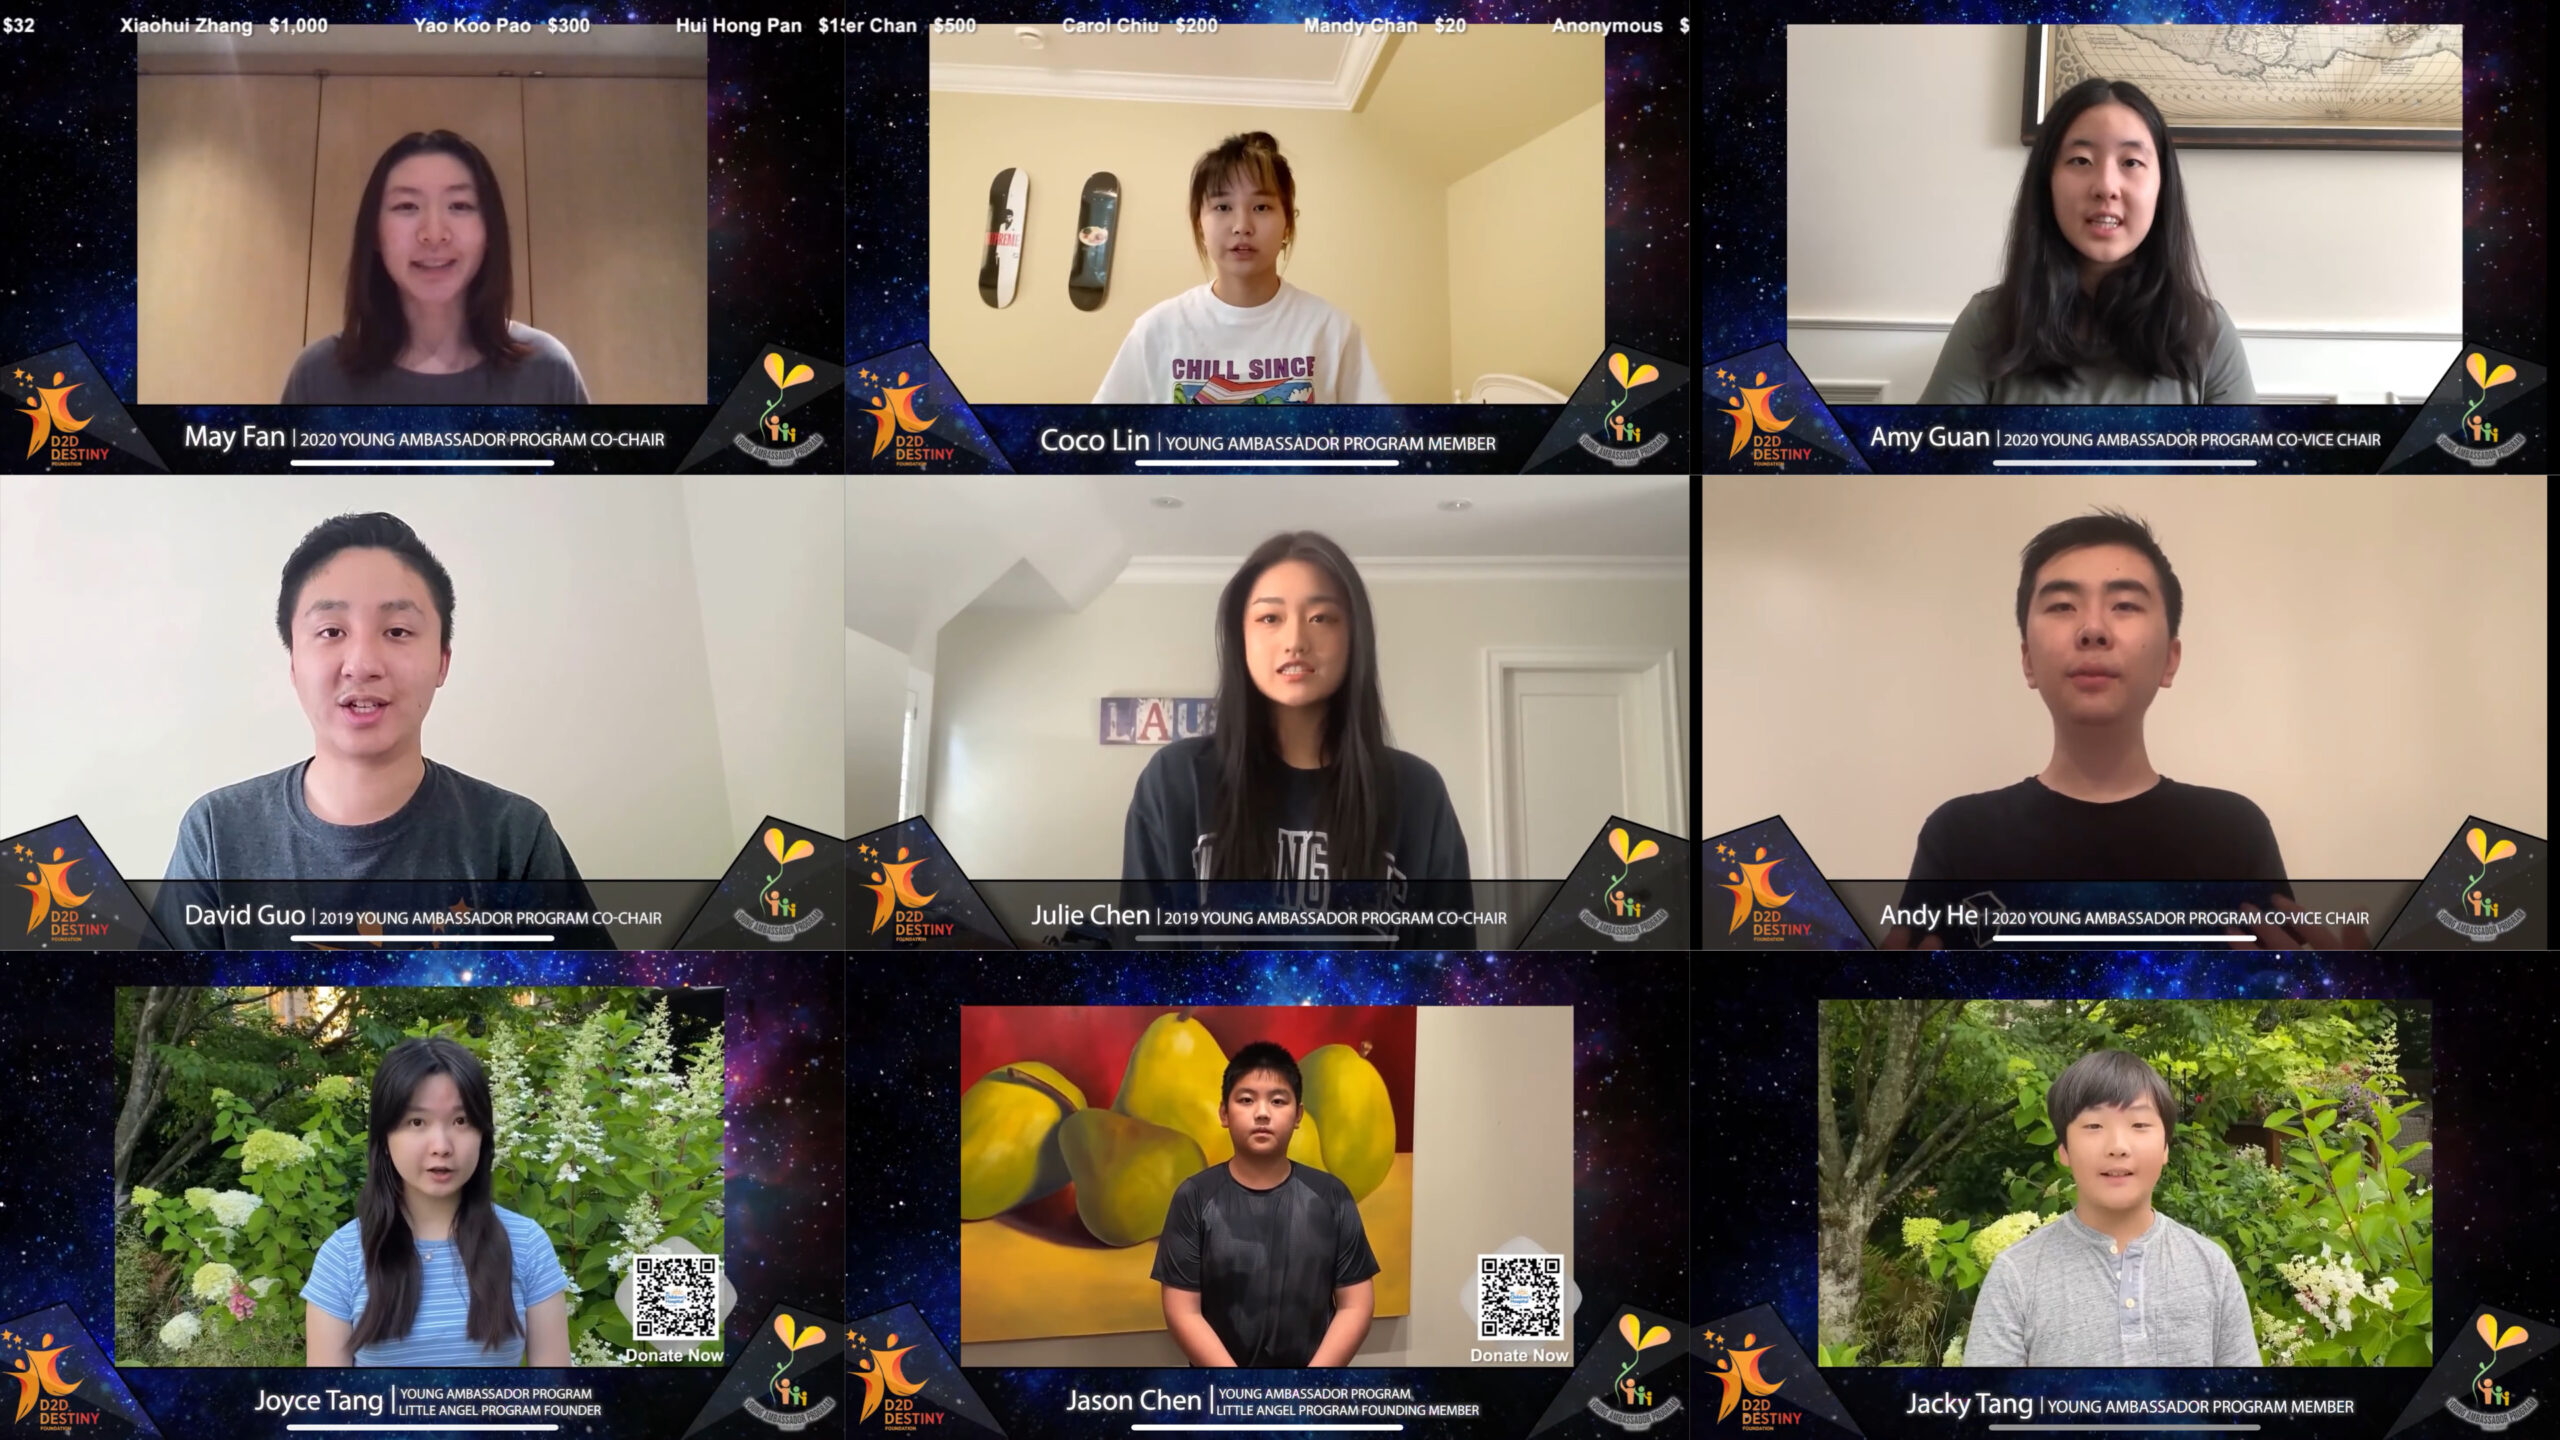 Members of the Young Ambassador Program